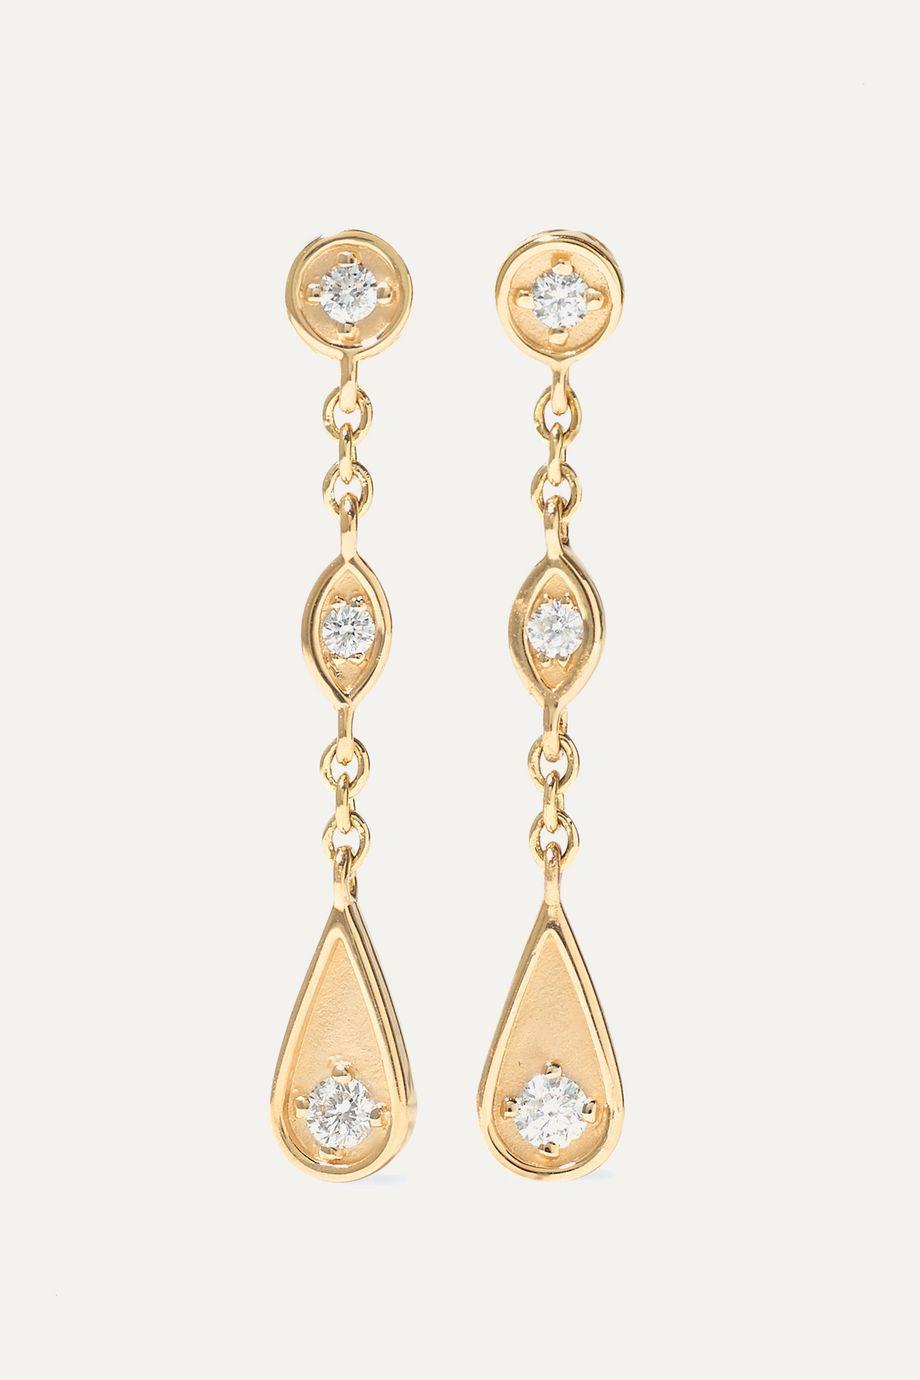 Sydney Evan 14-karat gold diamond earrings